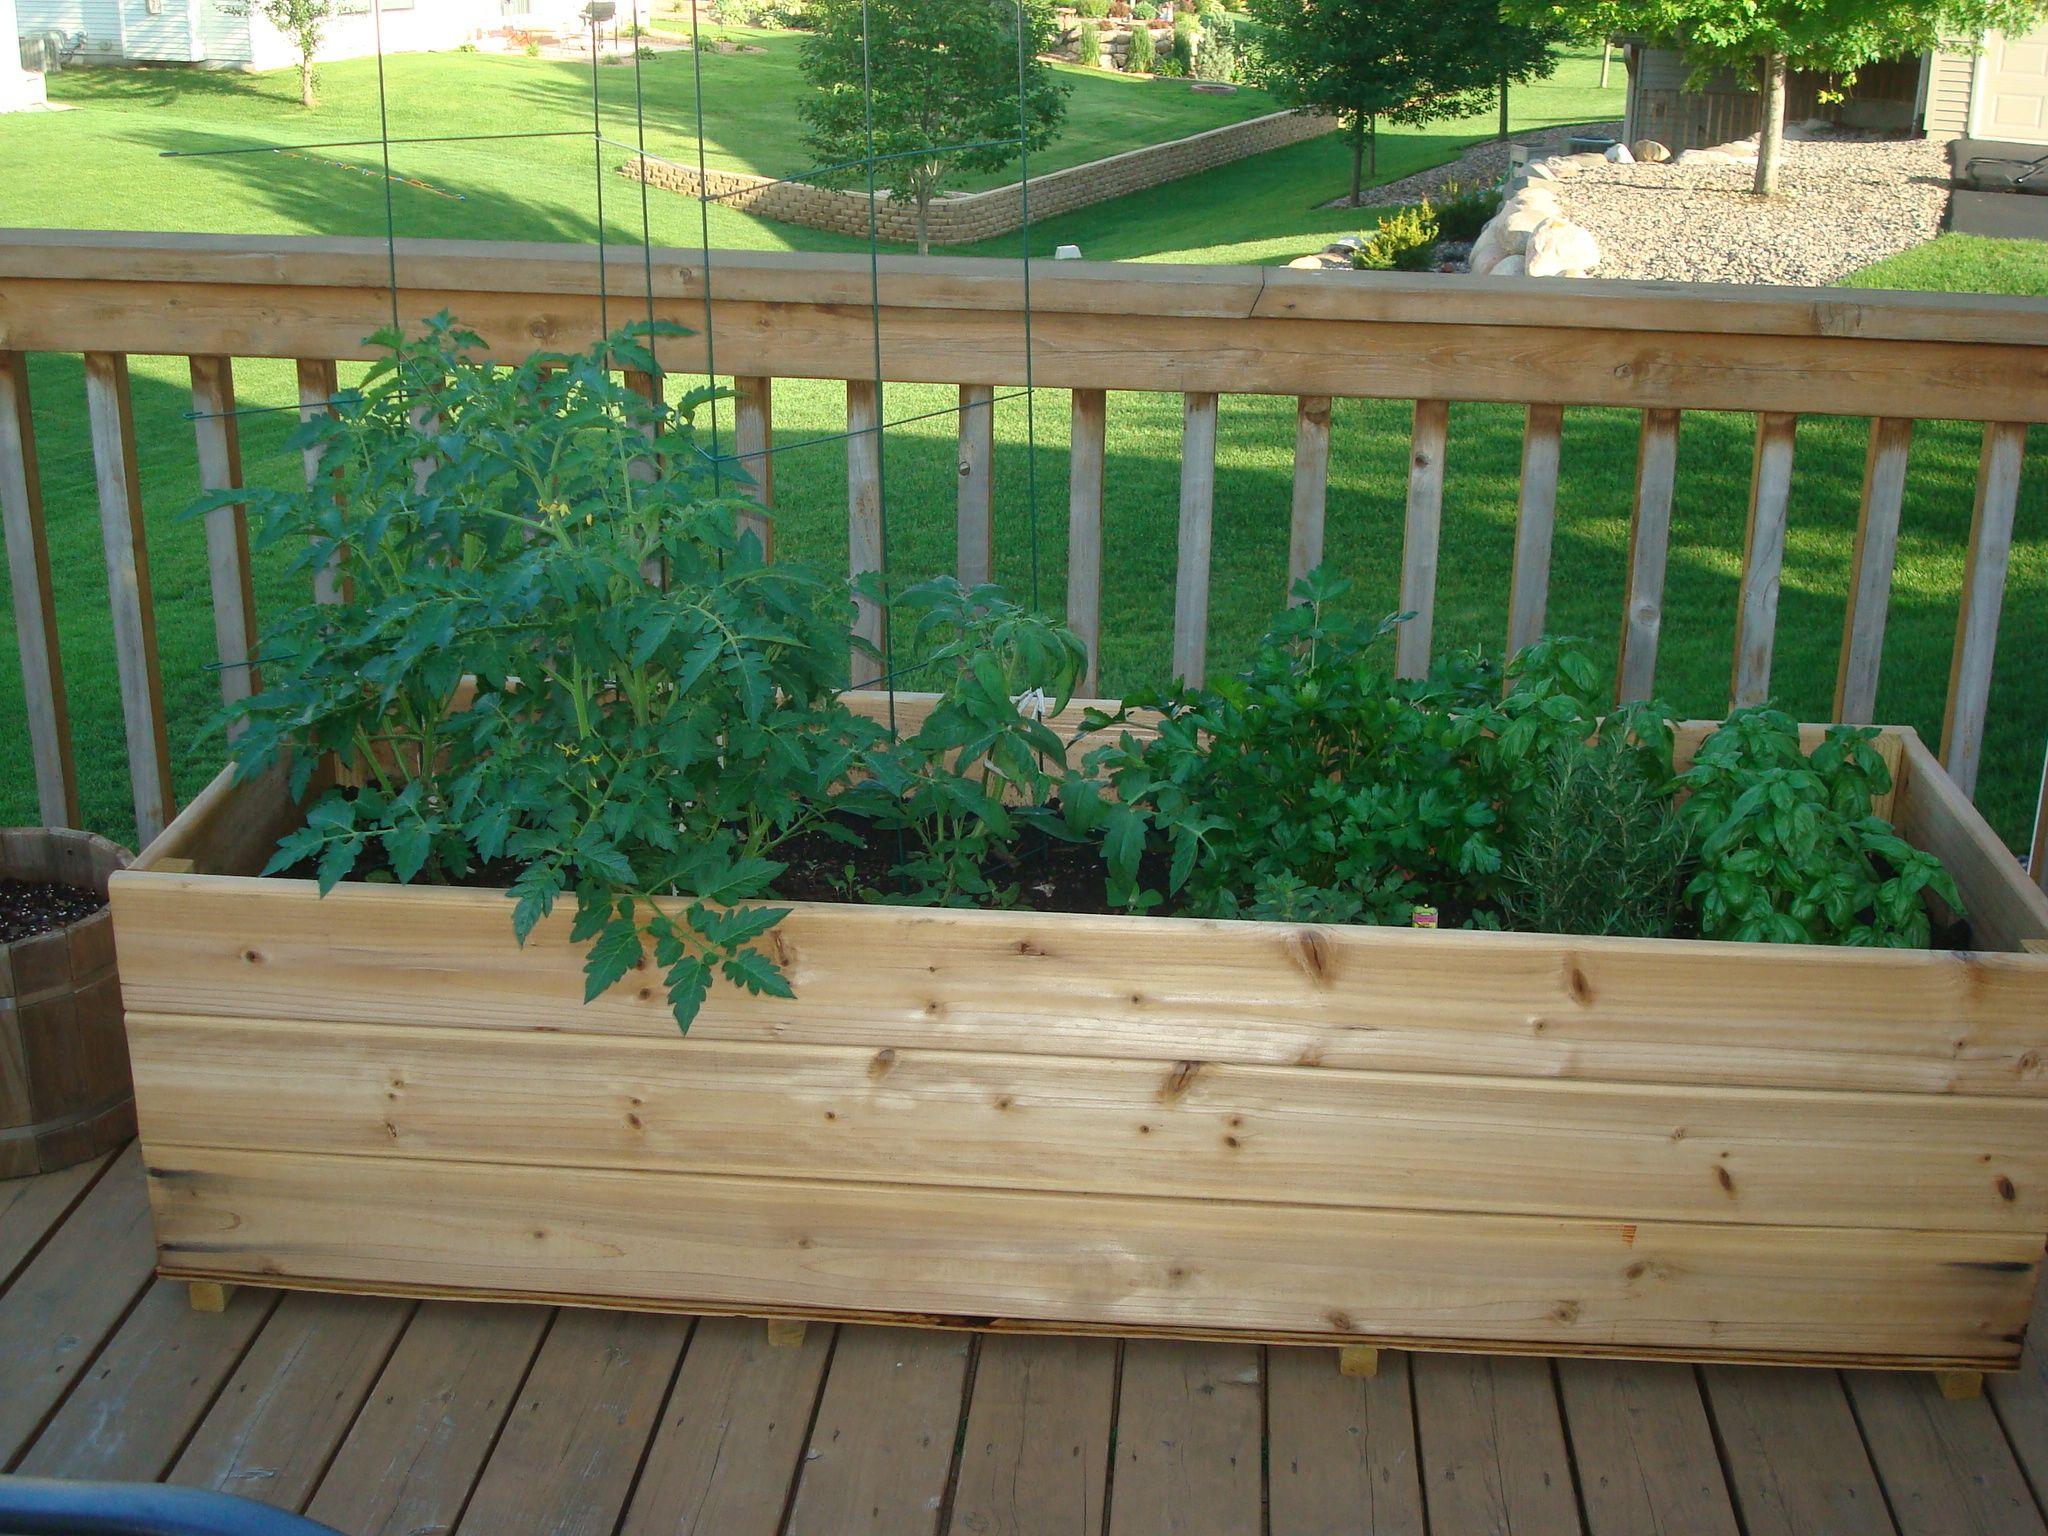 Awe Inspiring Container Garden Ideas On Deck Deck Garden